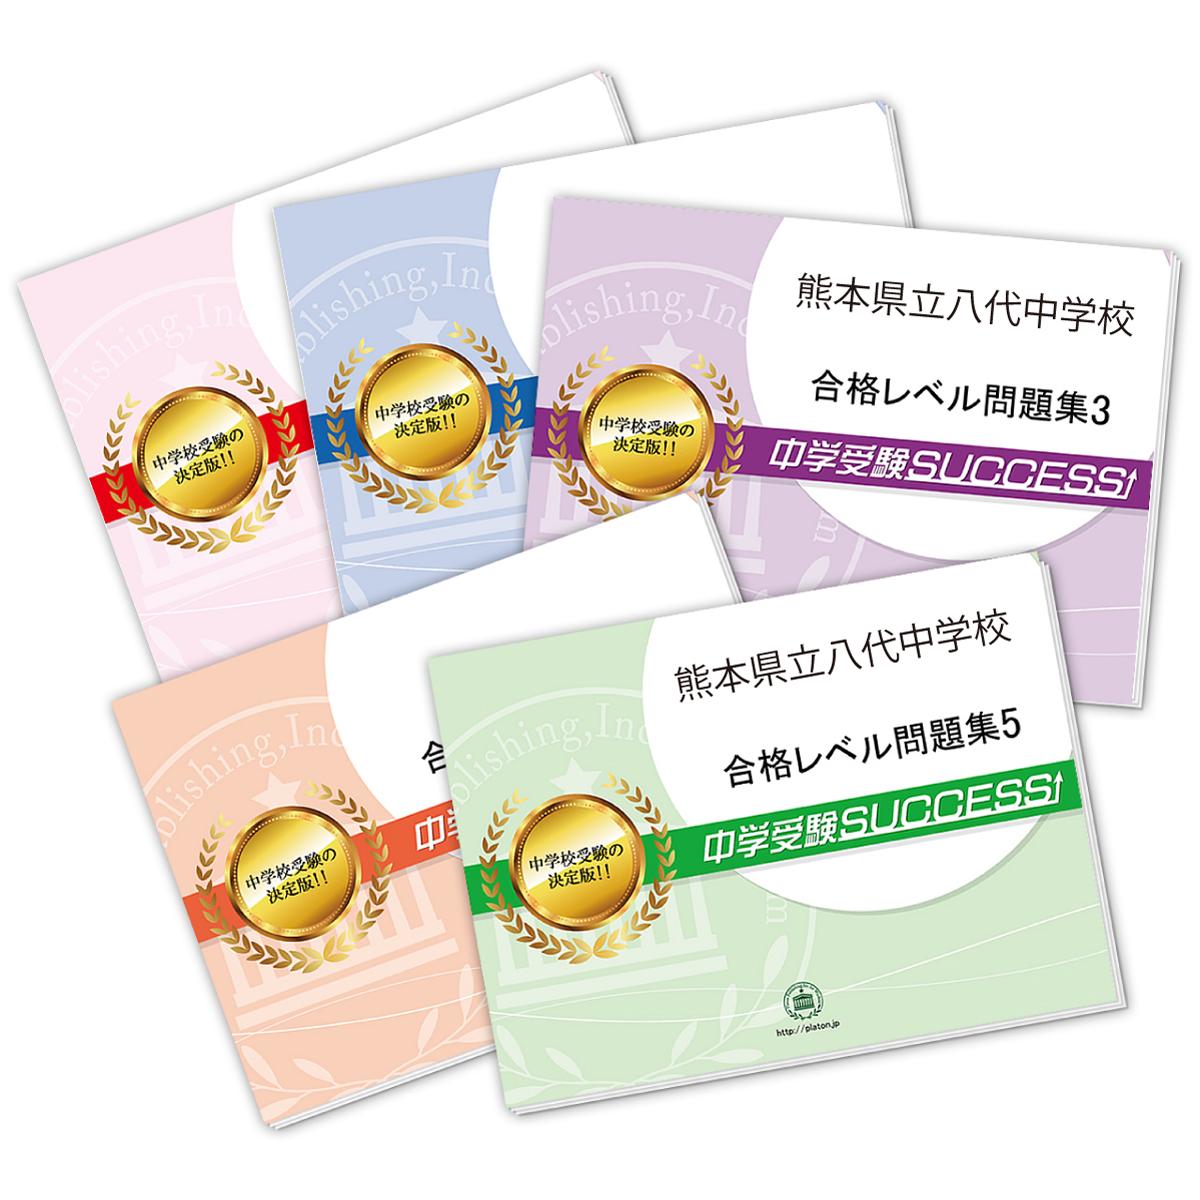 送料 登場大人気アイテム 代引手数料無料 熊本県立八代中学校 5冊 セール商品 直前対策合格セット